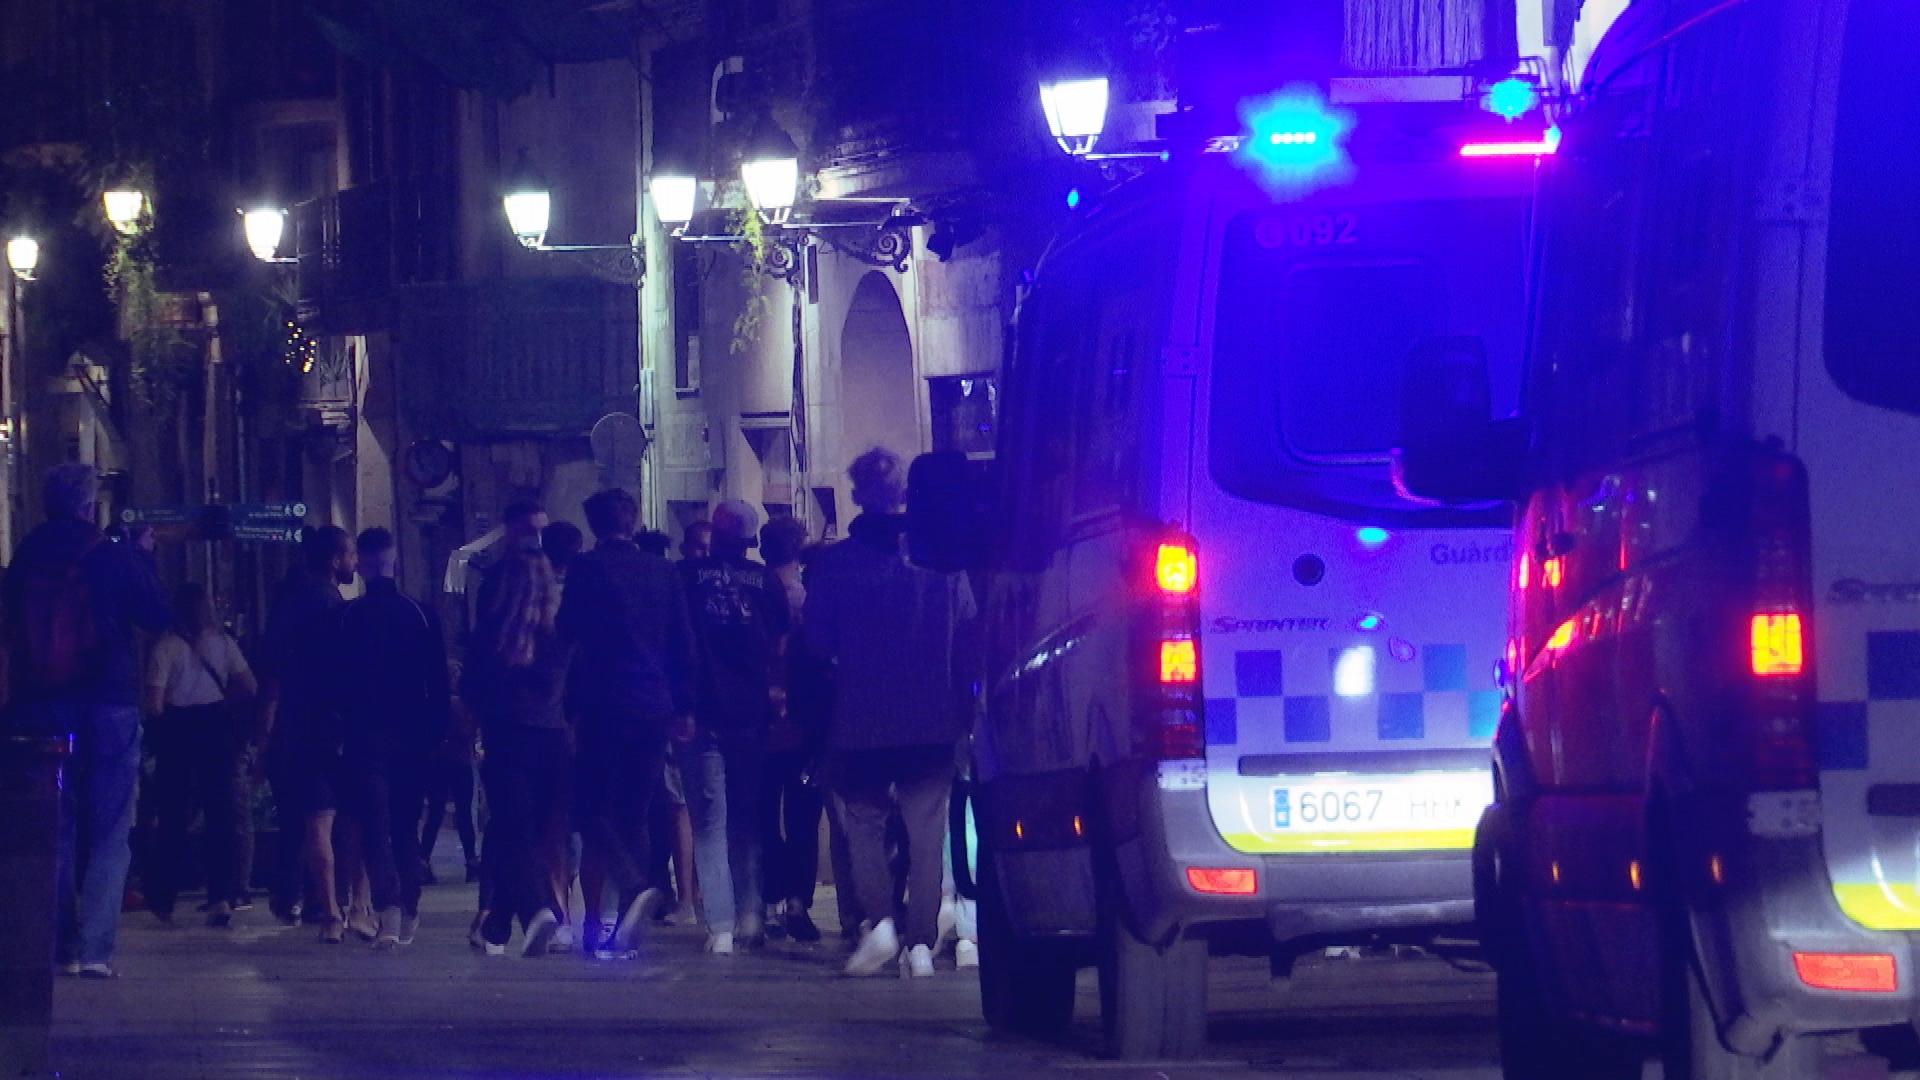 Guardia Urbana desallotjant carrers